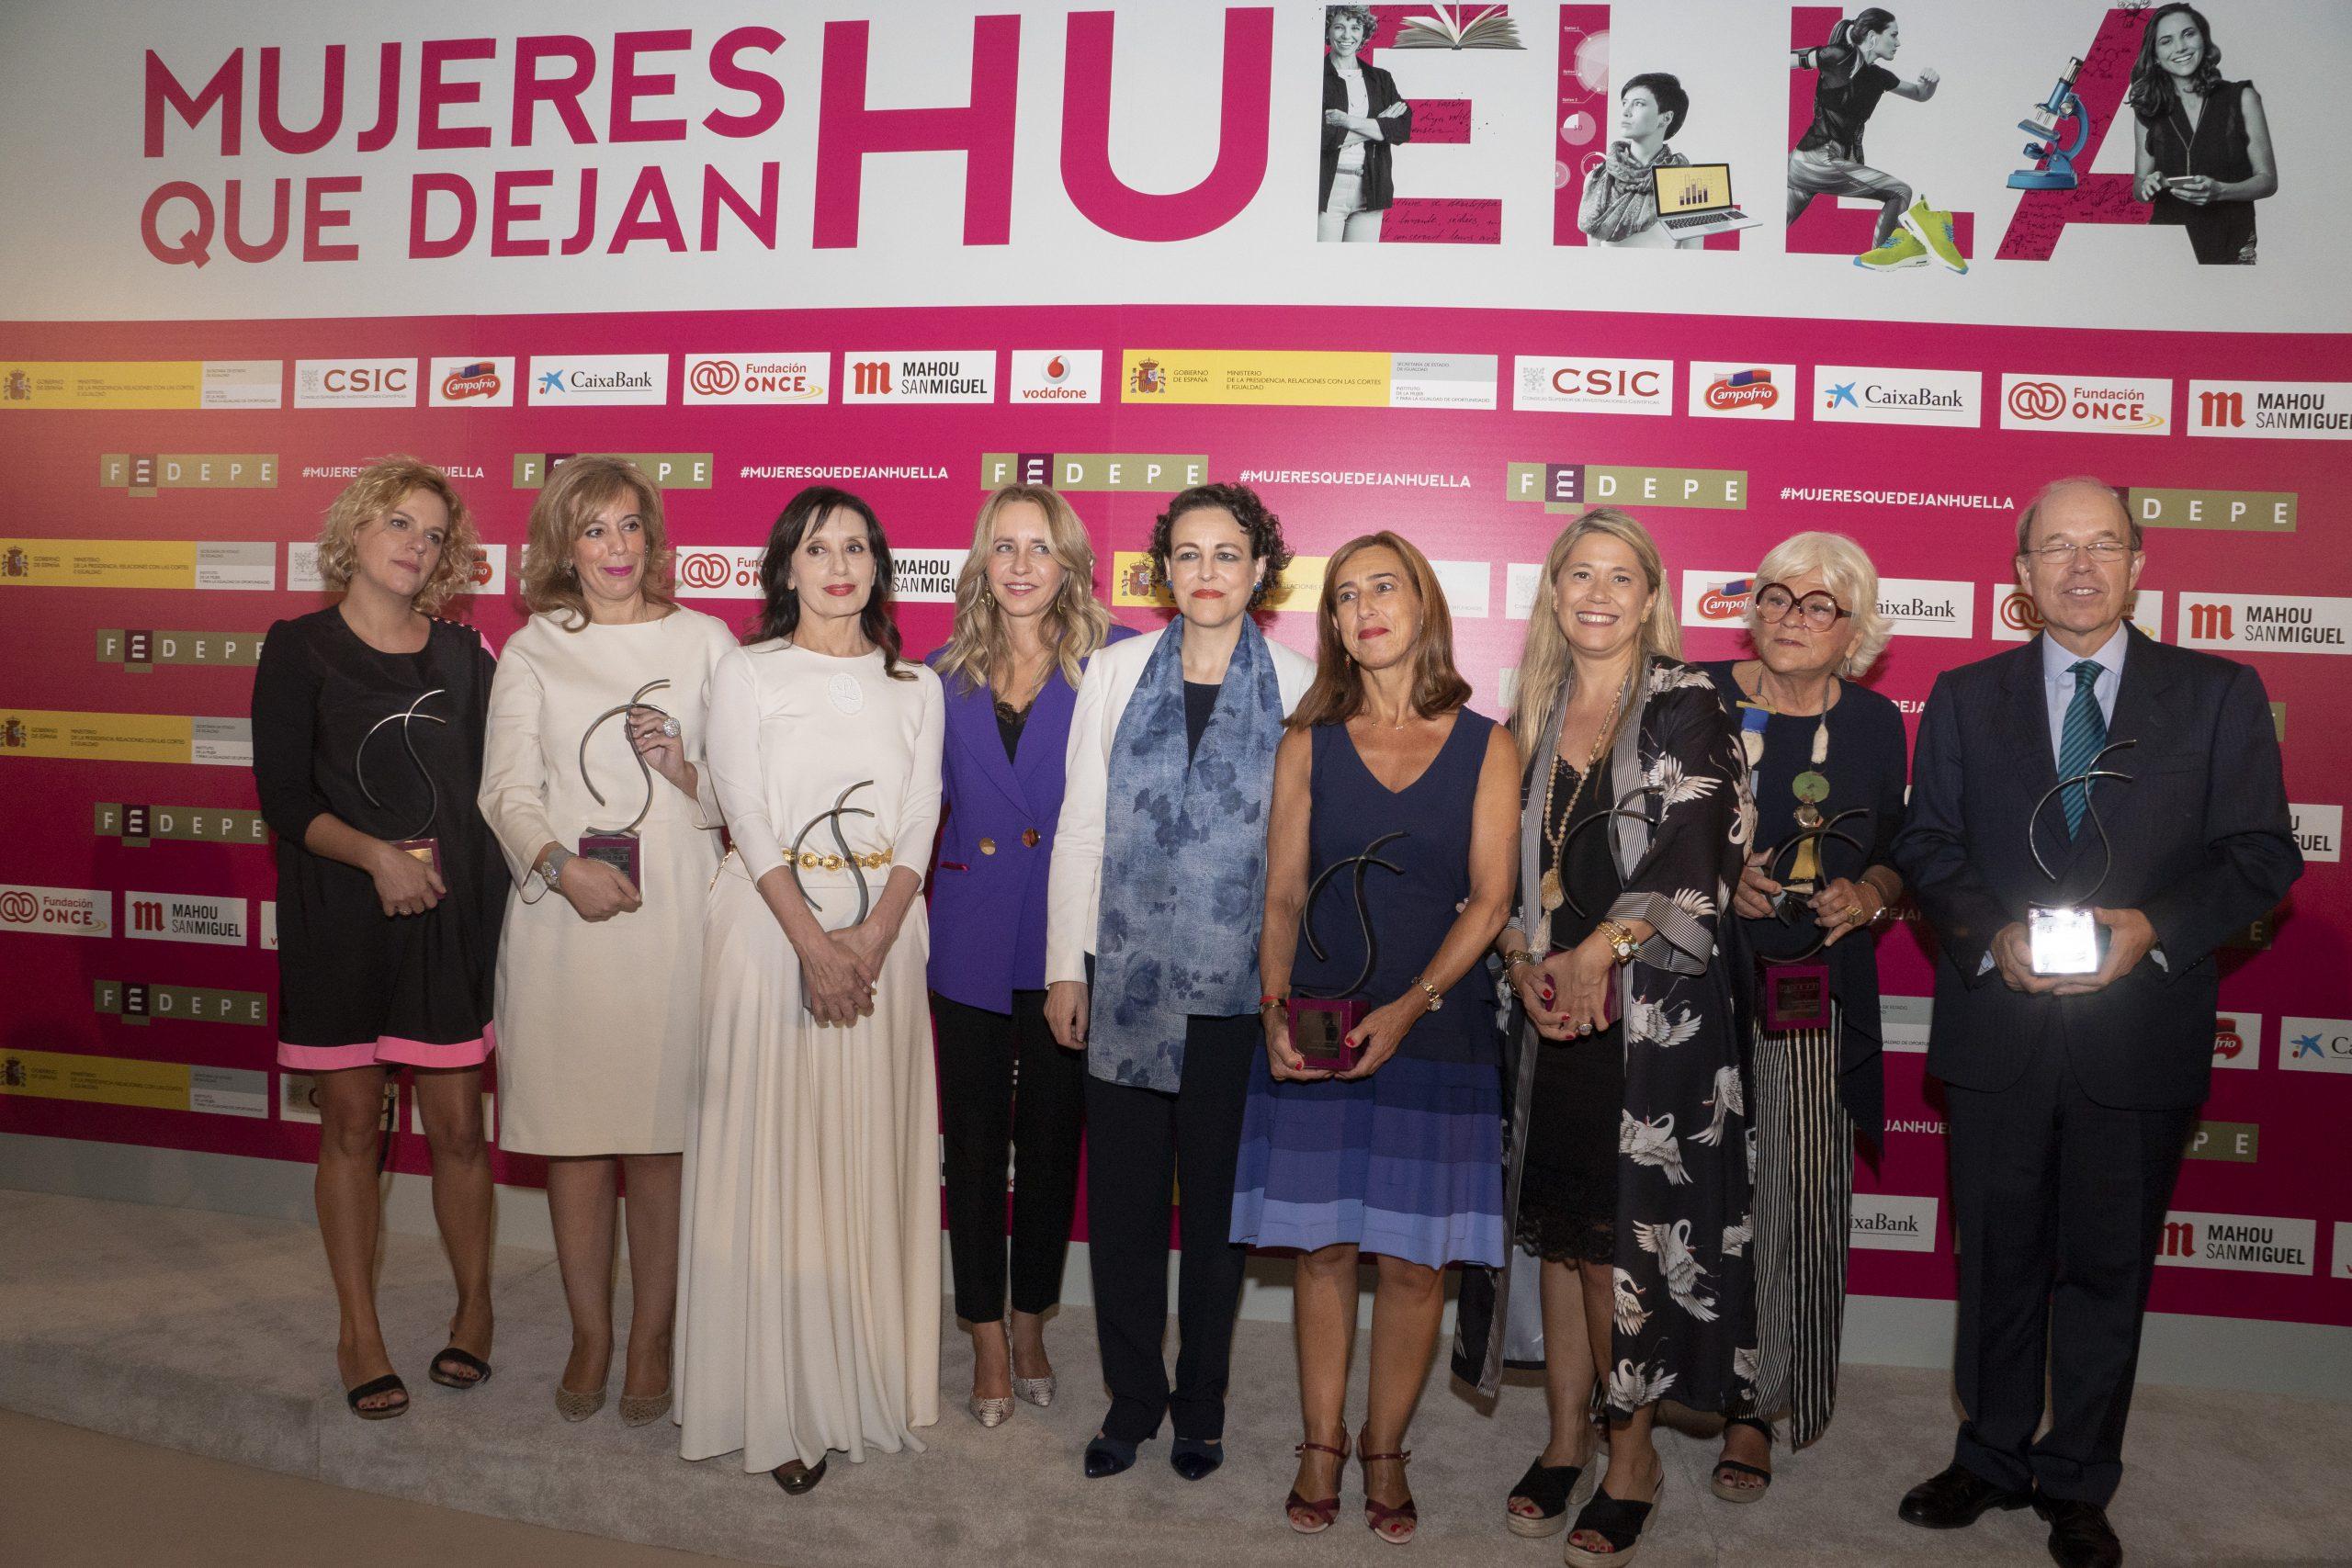 Premios FEDEPE 2018